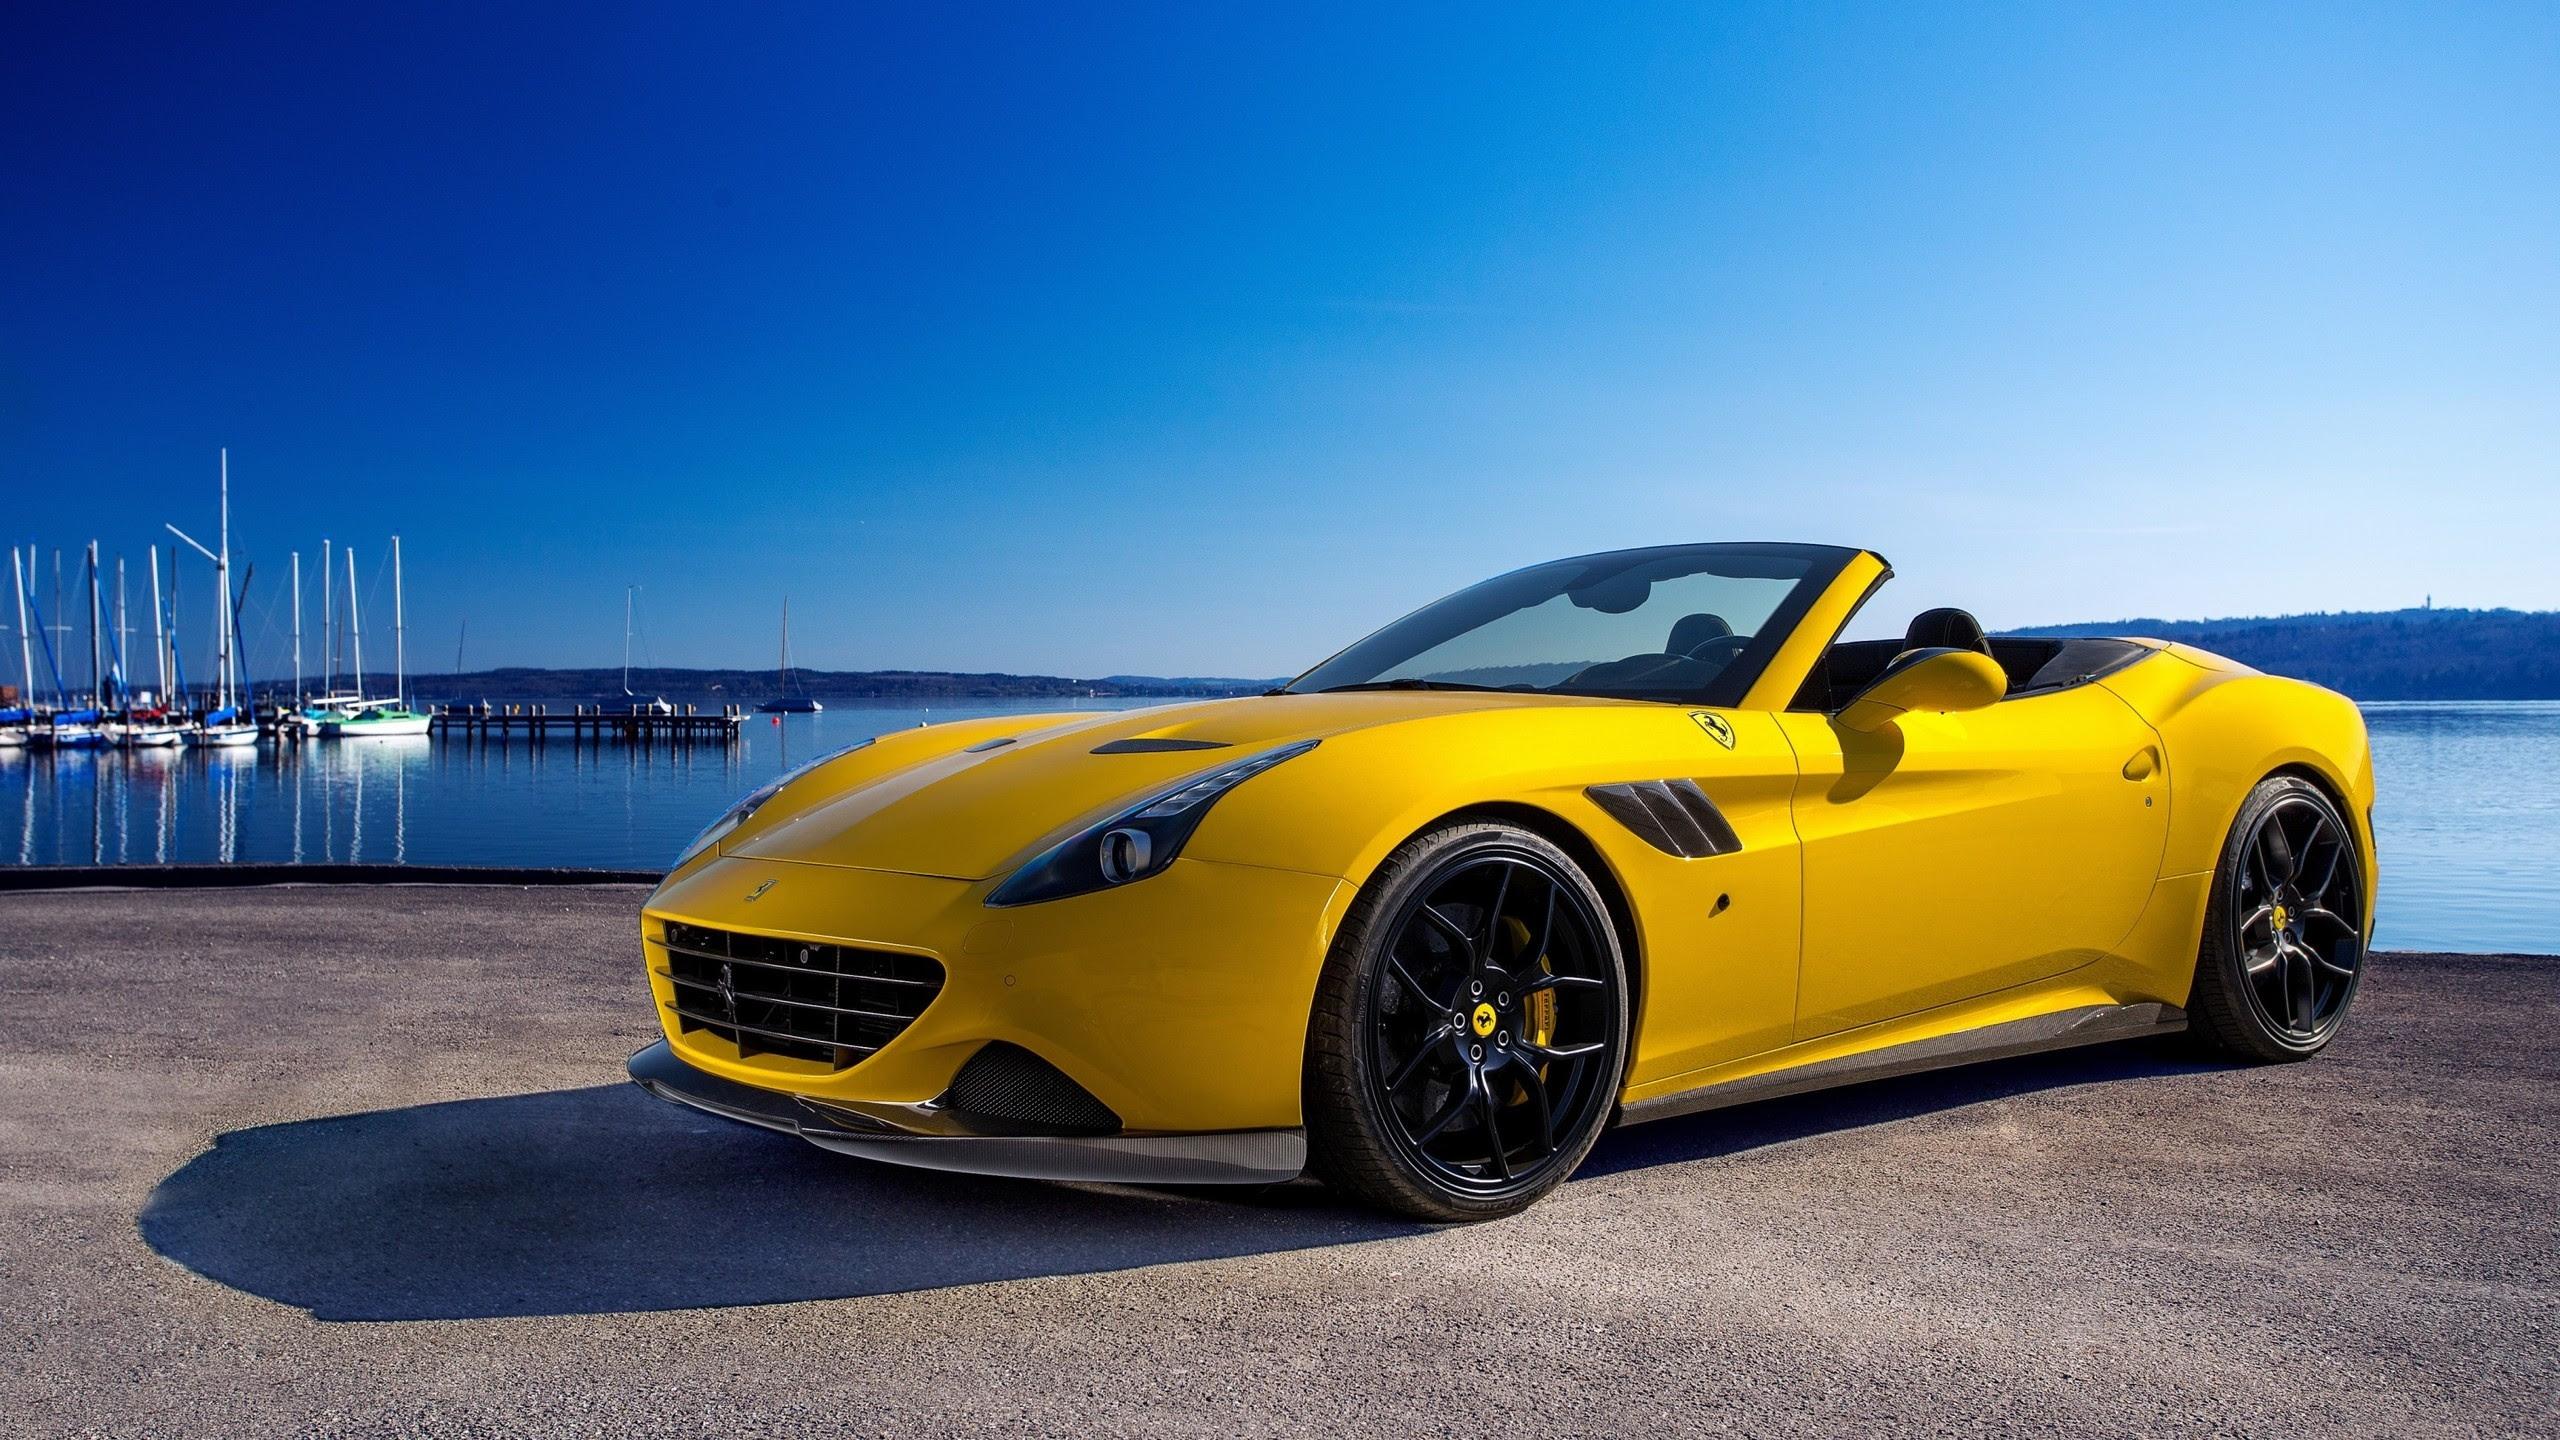 2016 Ferrari California T Vs 2009 California: What is new?